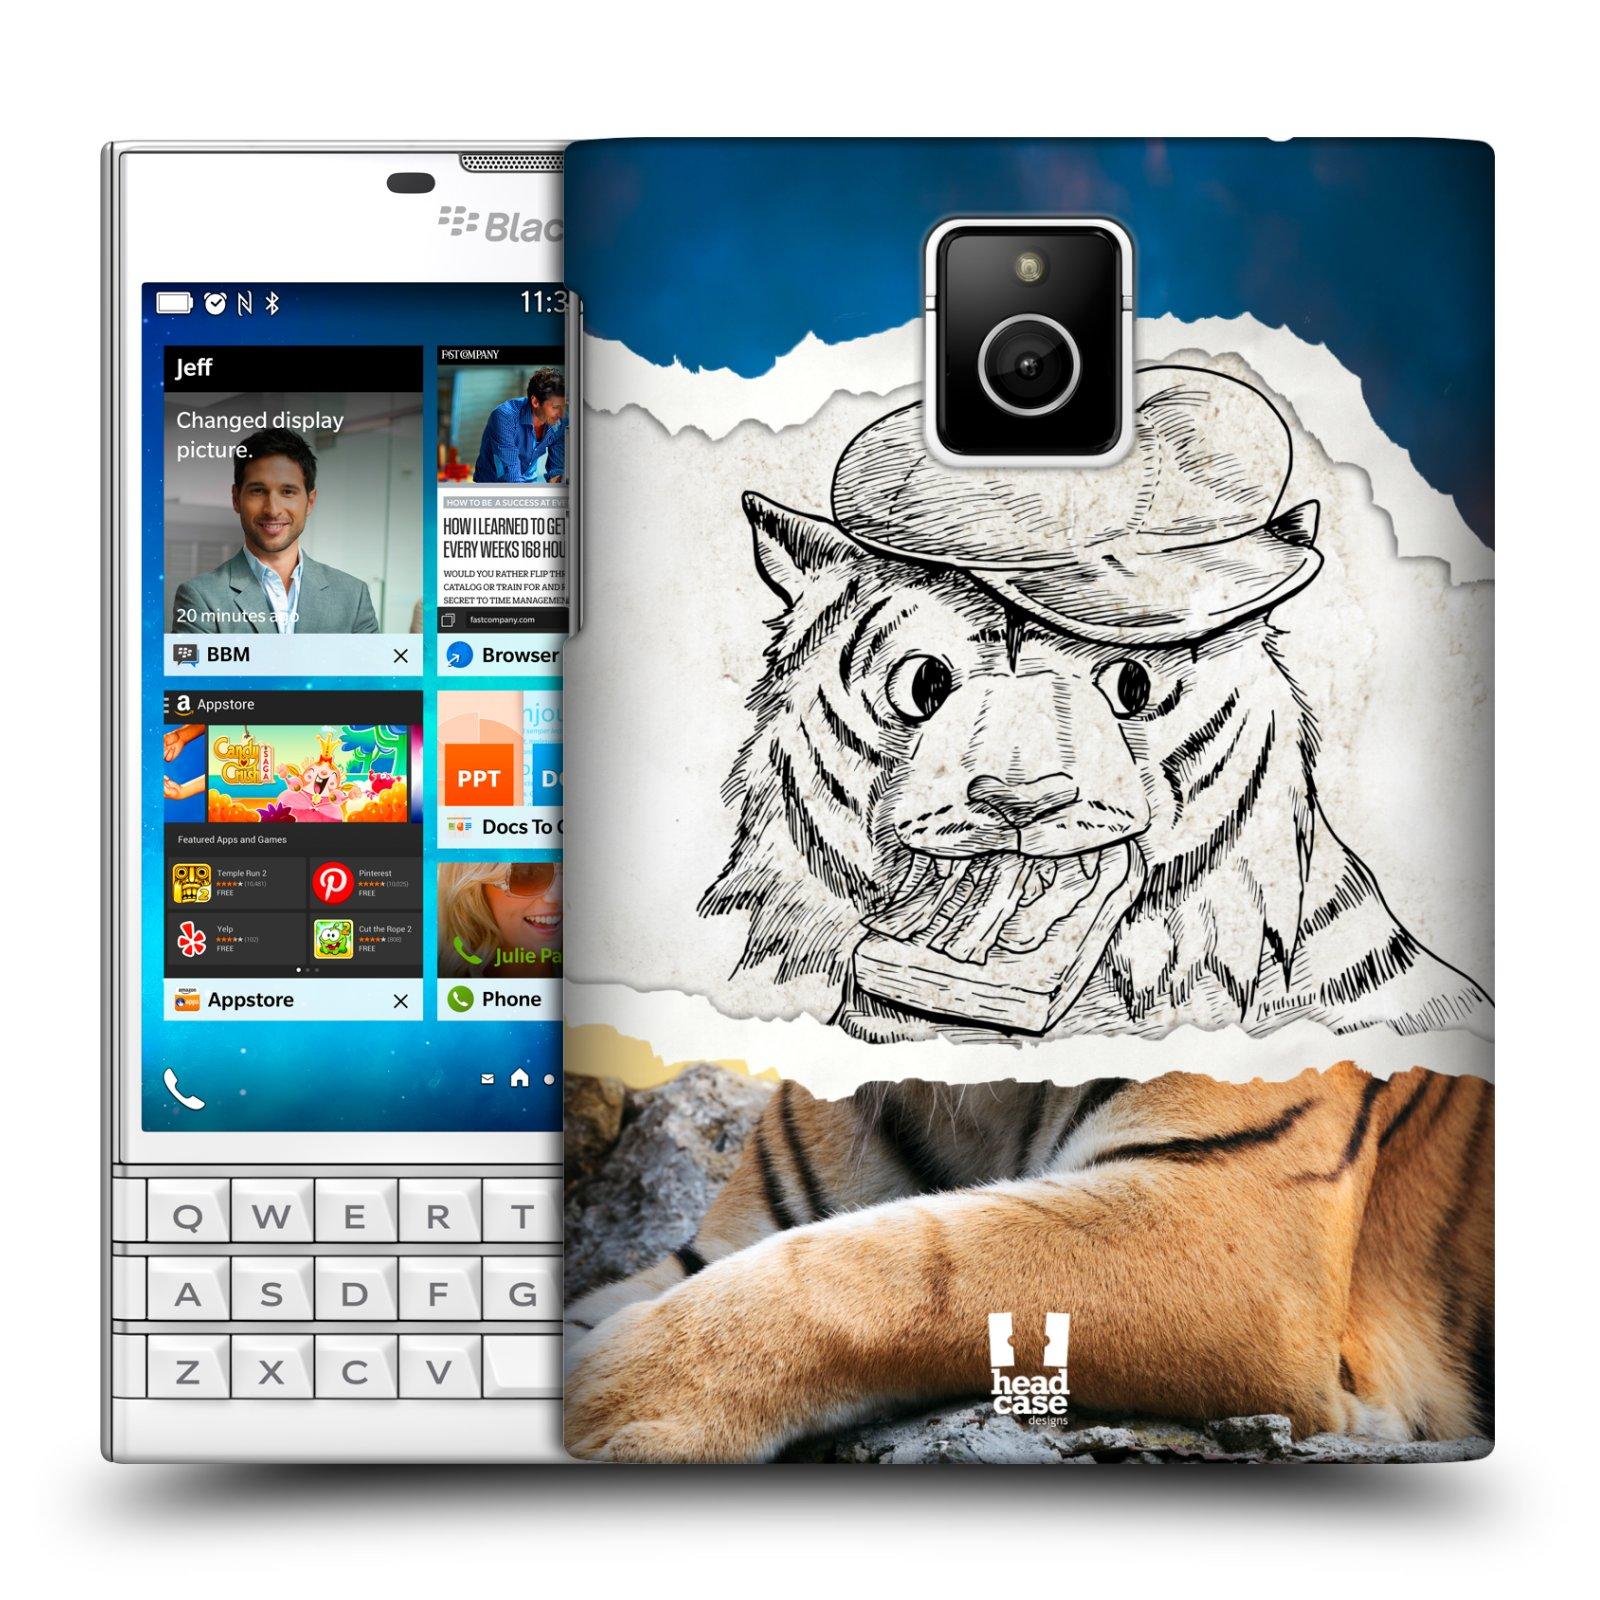 HEAD CASE plastový obal na mobil BlackBerry Passport vzor zvířata koláž tygr fešák